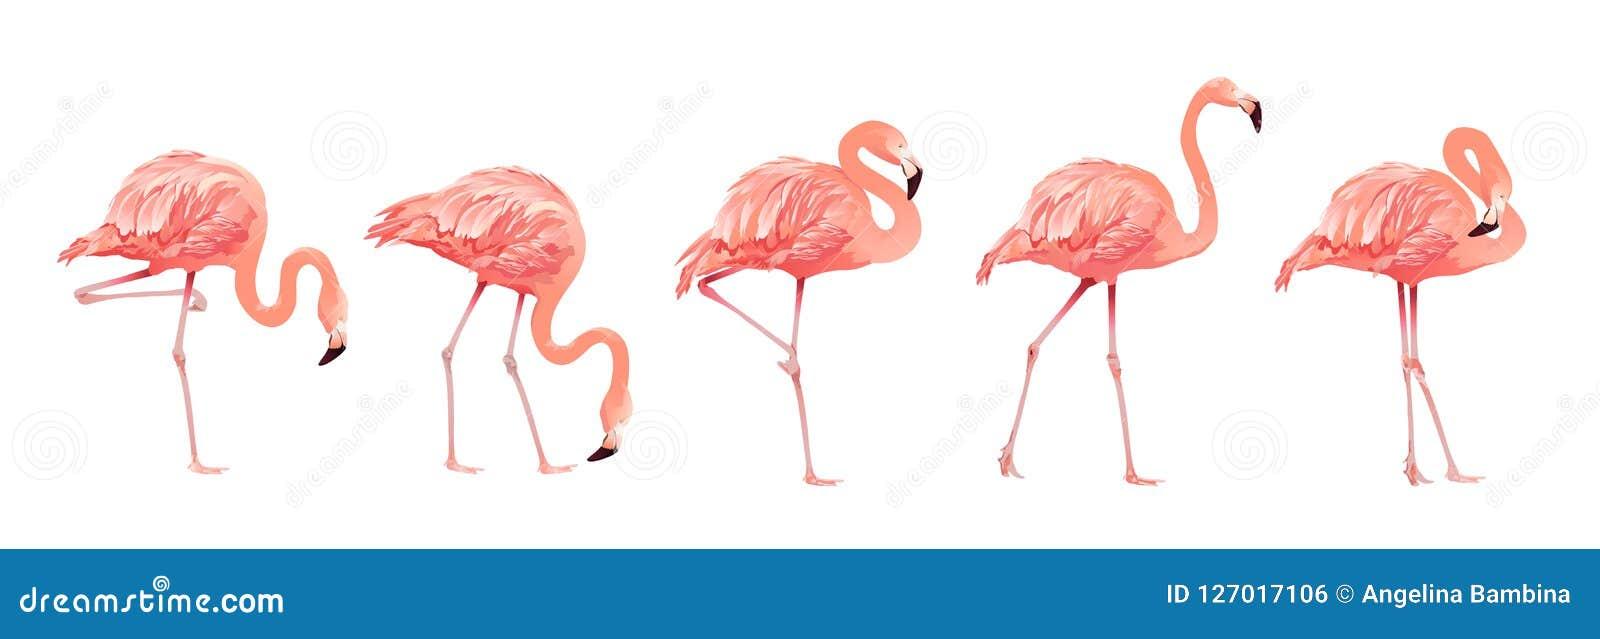 Pink Flamingo Bird Set Tropical Wild Beautiful Exotic Symbol Flat Design Style Isolated on White Background. Vector